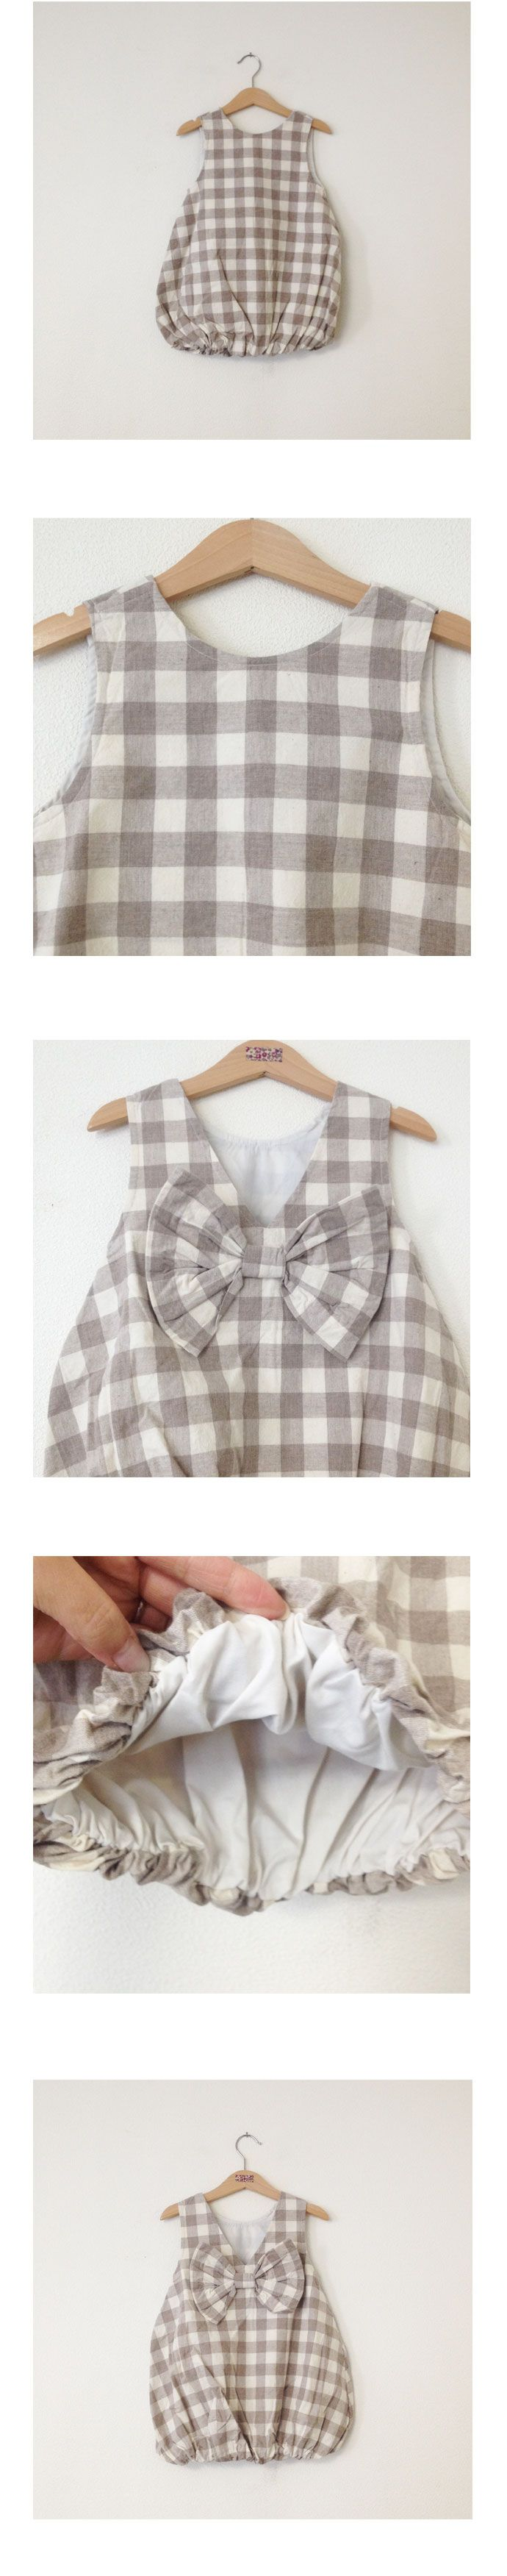 "kukka select バックリボンバルーンワンピース(ベージュ)- Amber(アンバー)・Annika(アニカ)など可愛い韓国子供服・ベビー服通販ショップ【KUKKA PAKETTI クッカパケッティ】ちょっぴり背伸びしたSweet&Cuteな女の子服から、レトロな北欧系まで、女の子の""かわいい""が叶うアイテムを厳選セレクト。"